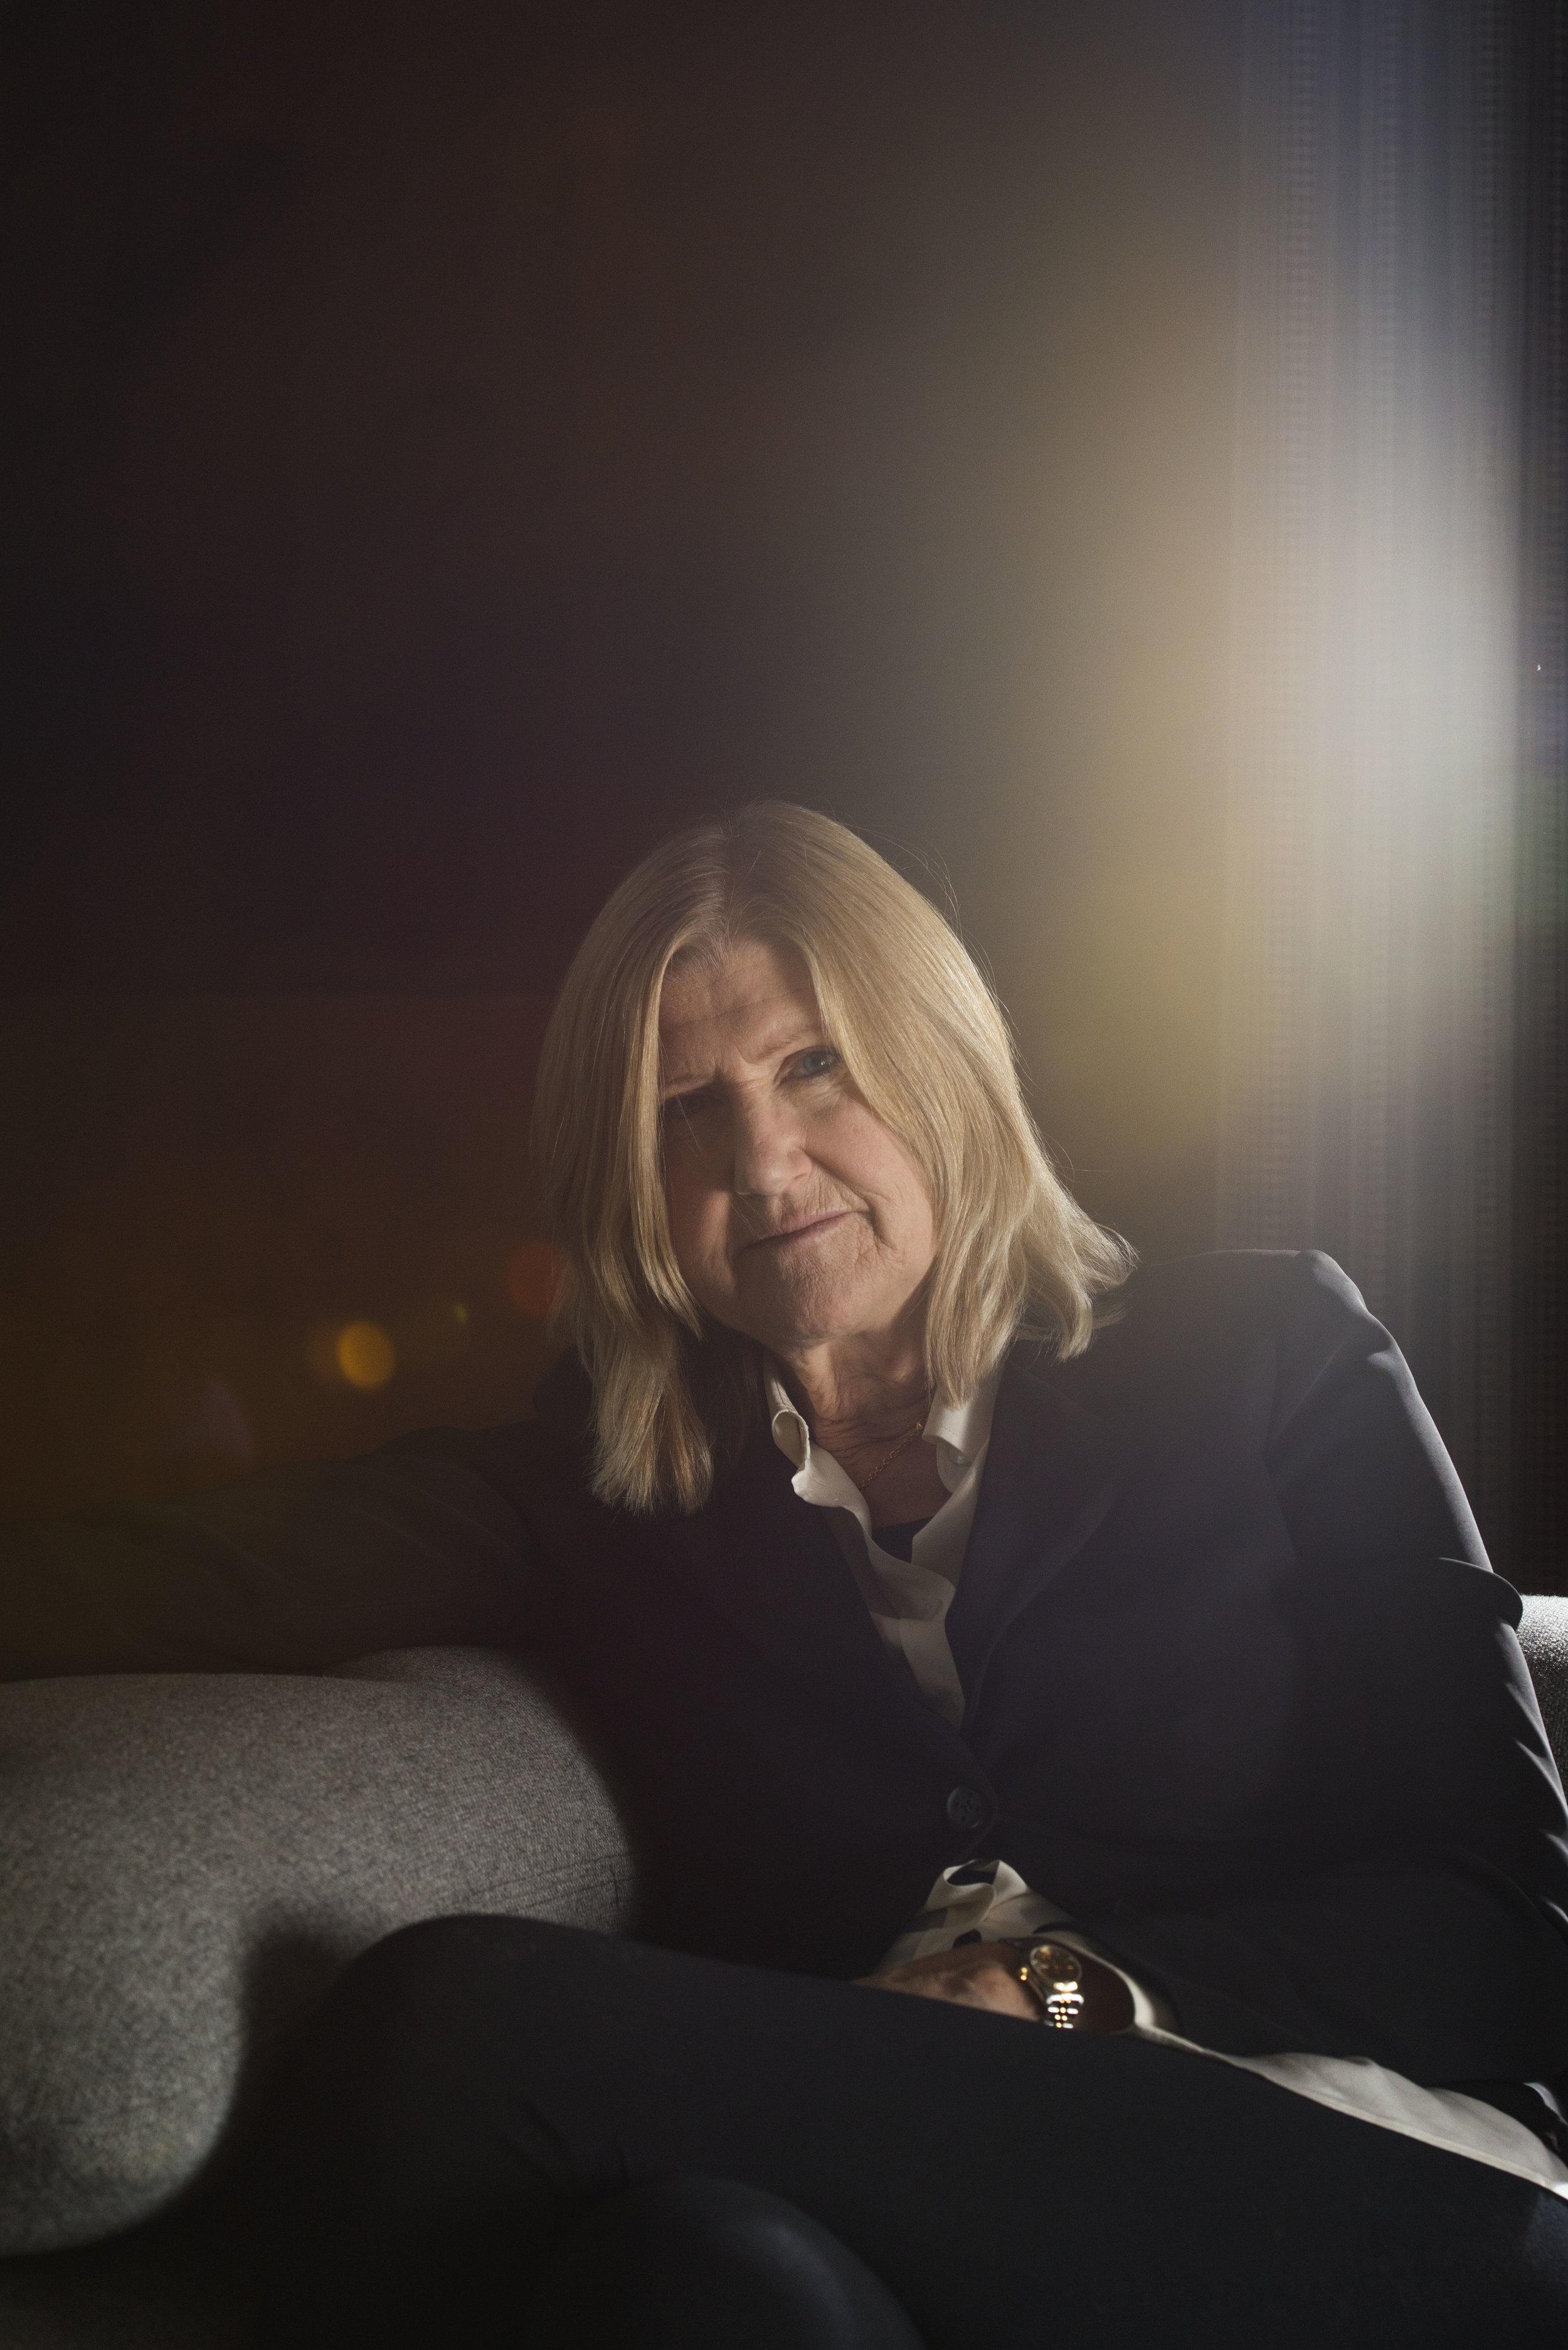 Musician Anne Grethe Preus